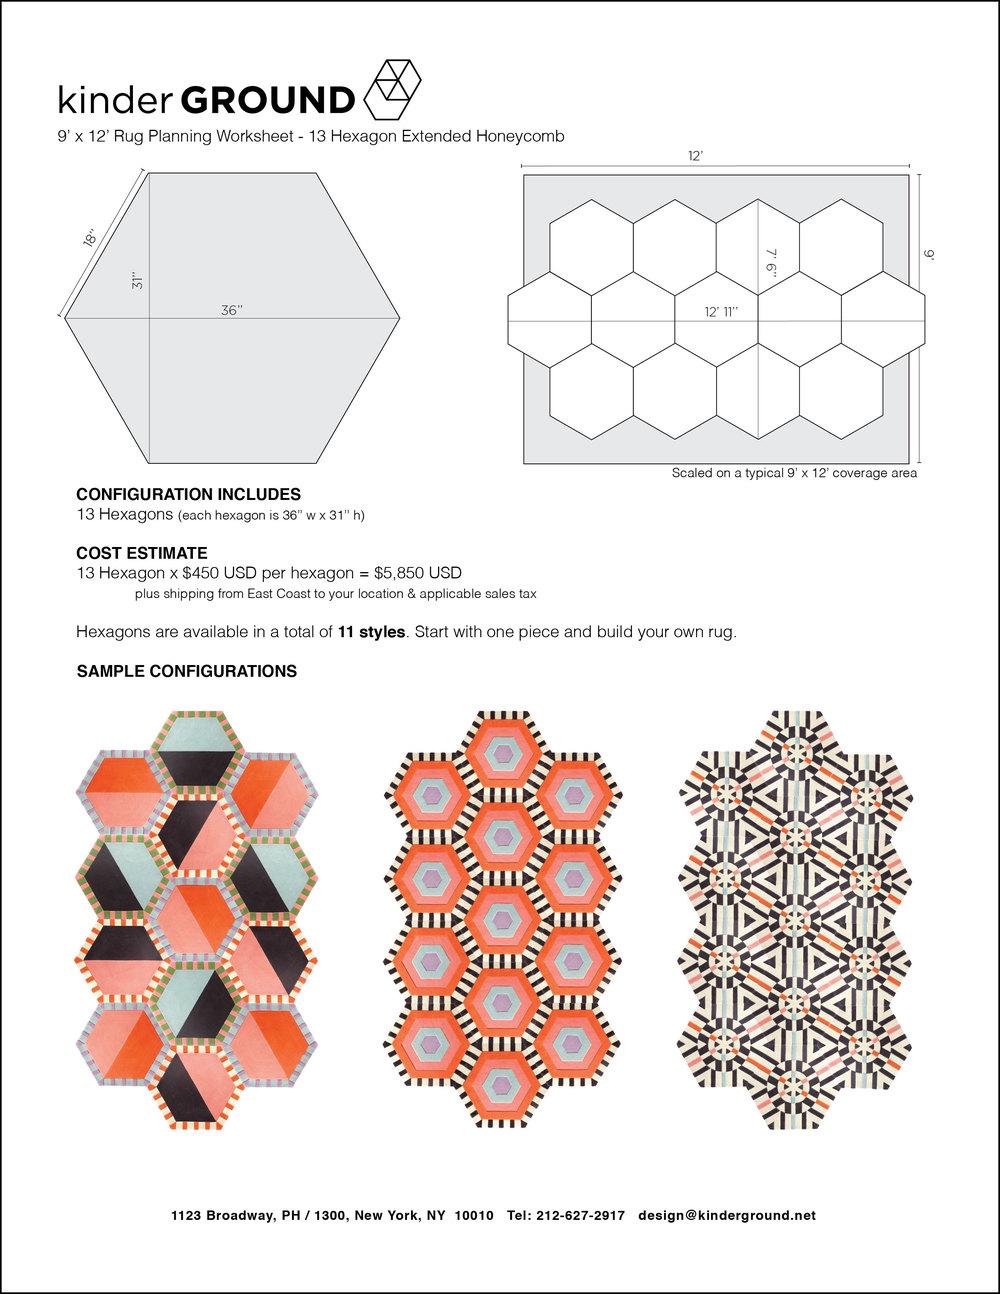 13-Hexagon Extended Honeycomb